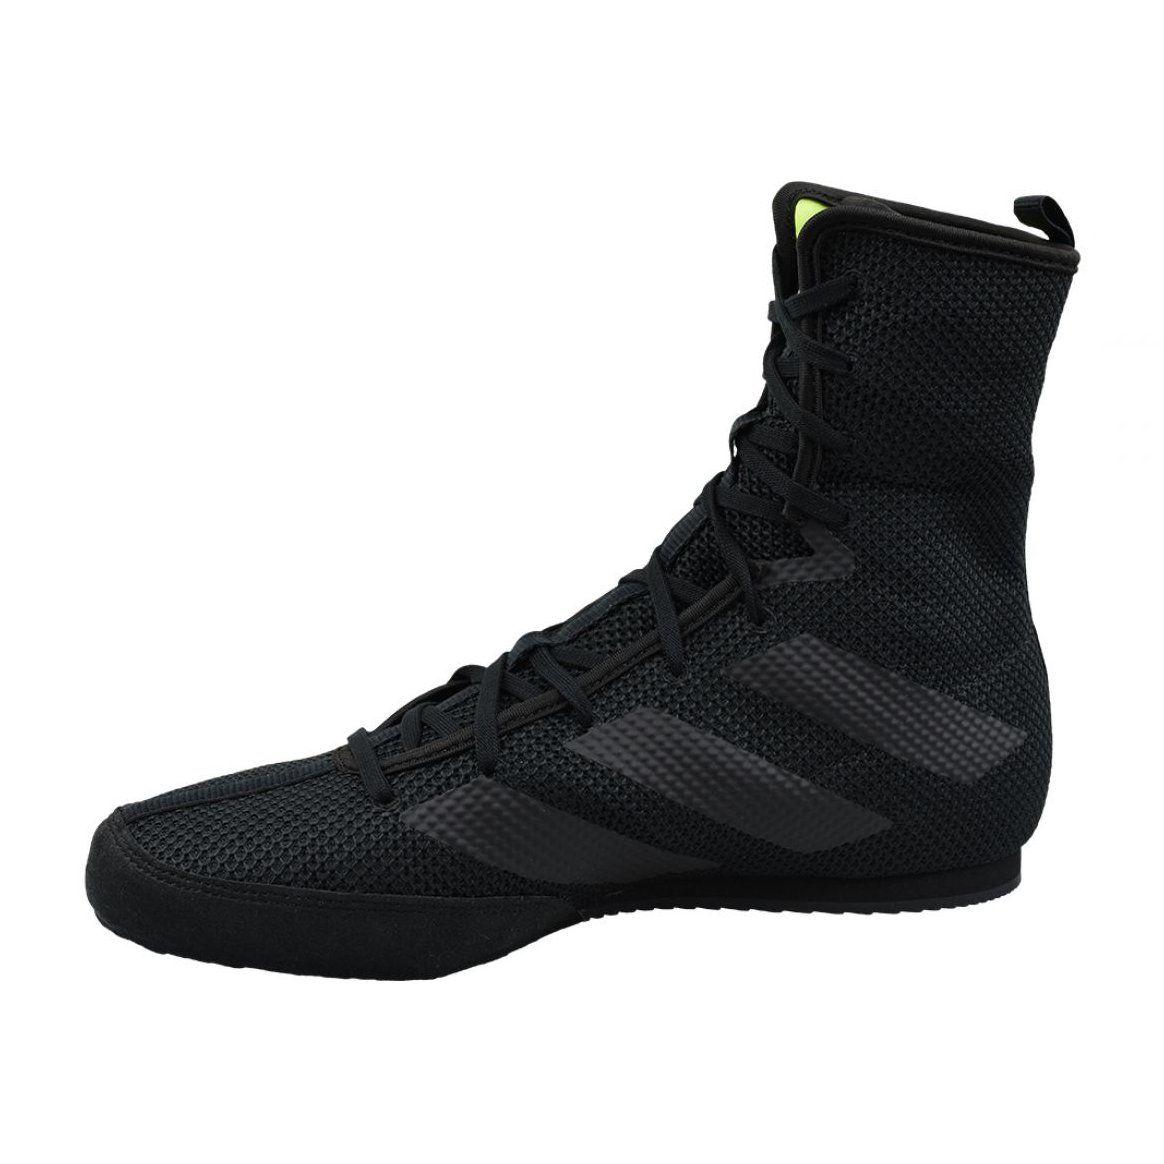 Buty Adidas Box Hog 3 F99921 Czarne Black Shoes Sports Shoes Adidas Boxing Shoes